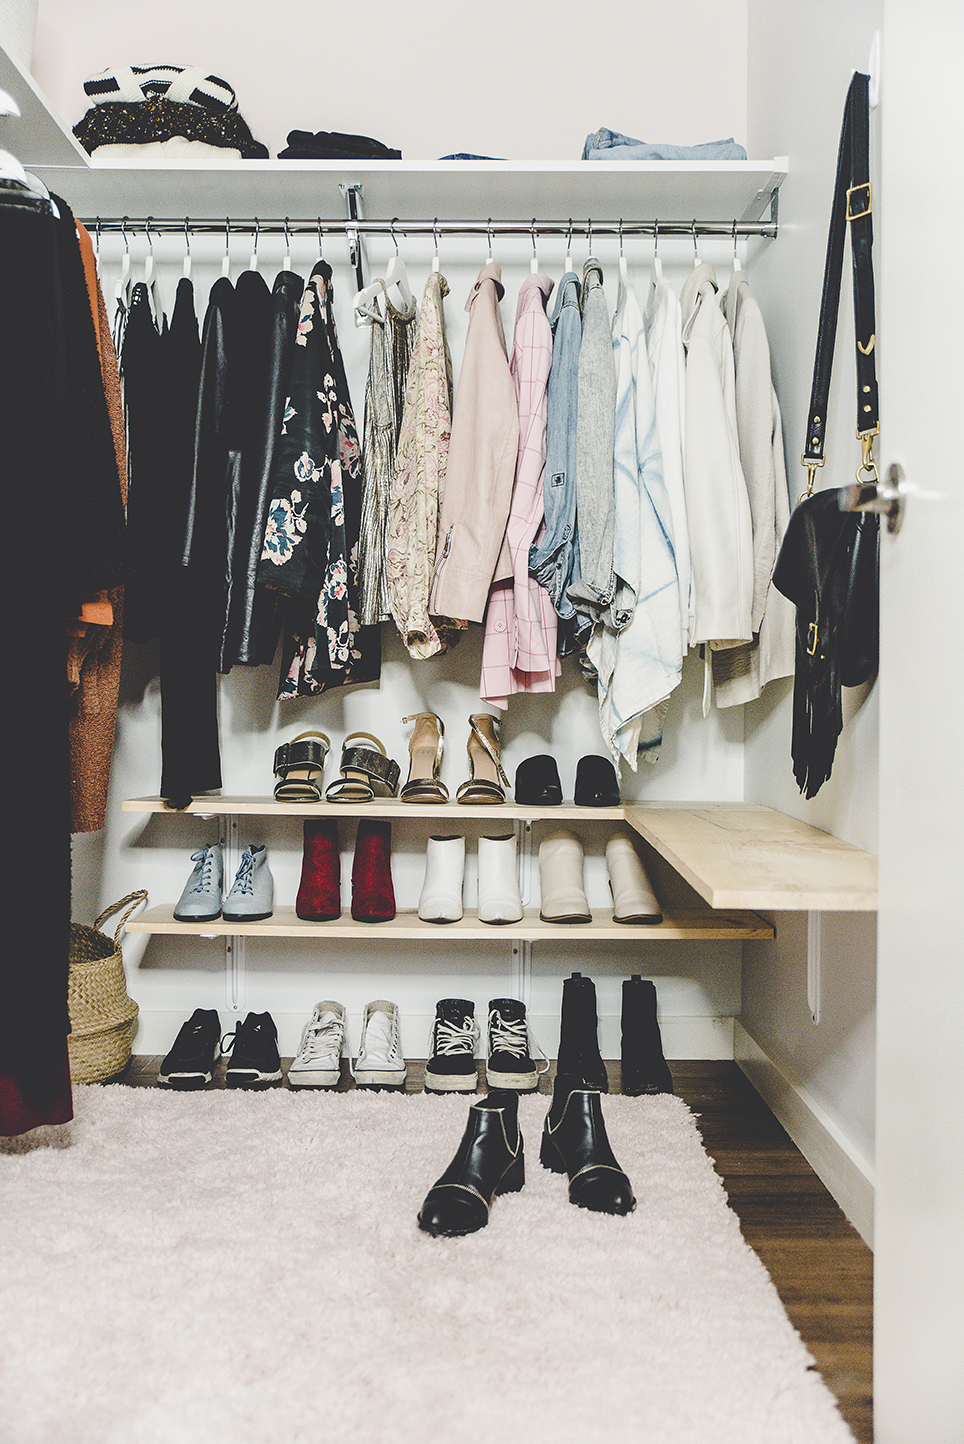 steph_closet_teasers_007.jpg